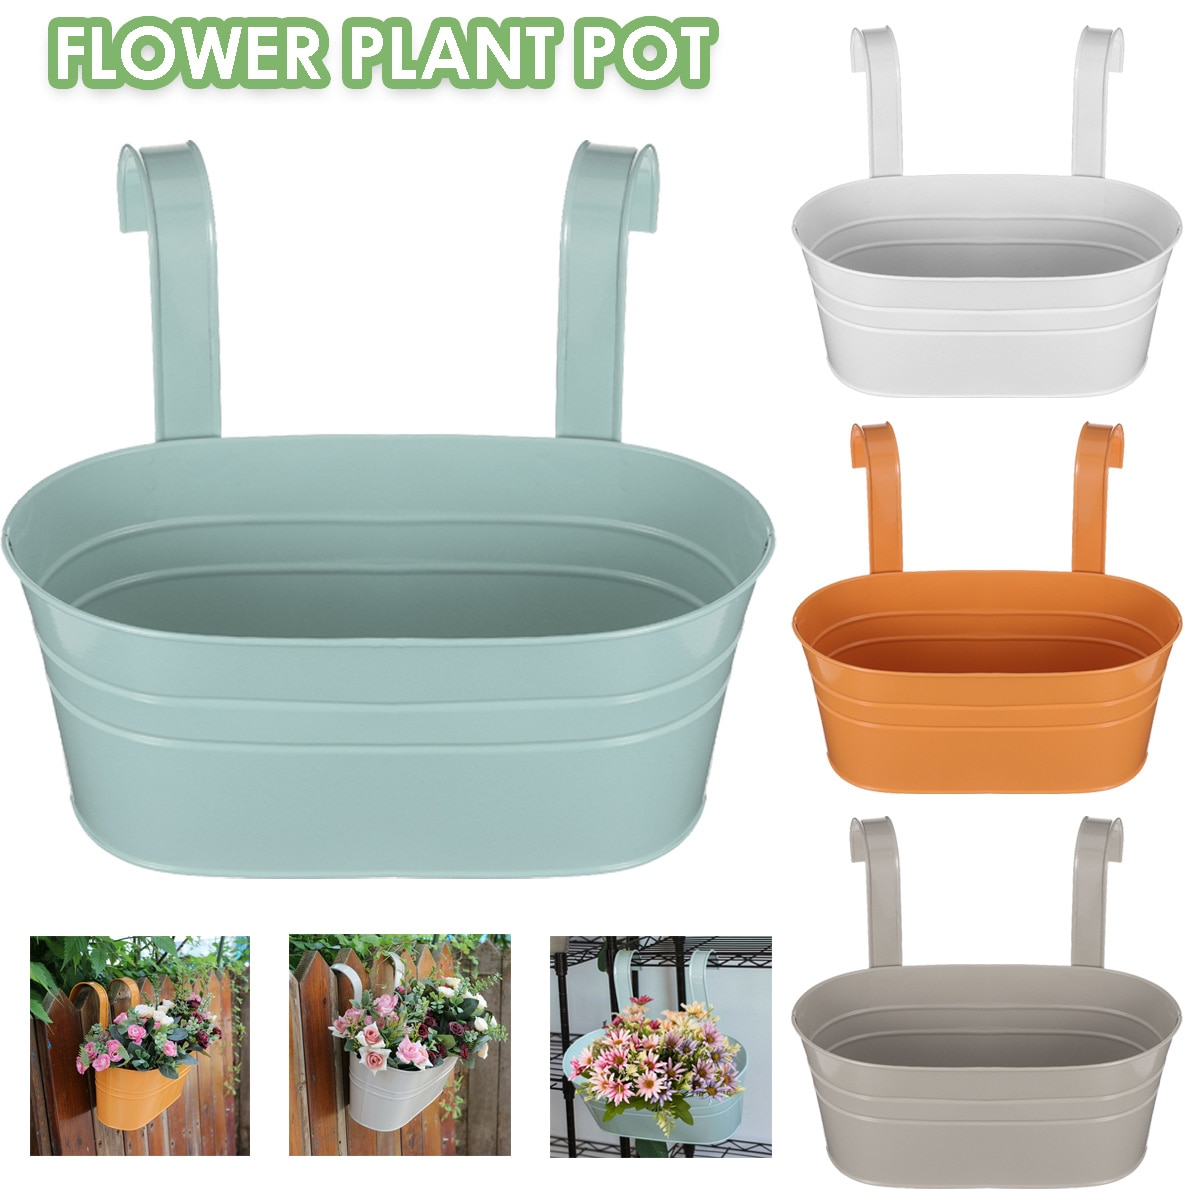 Planta de Metal ovalada, maceta, cerca, balcón, jardín, maceta colgante, maceta decorativa clásica para el hogar, macetas